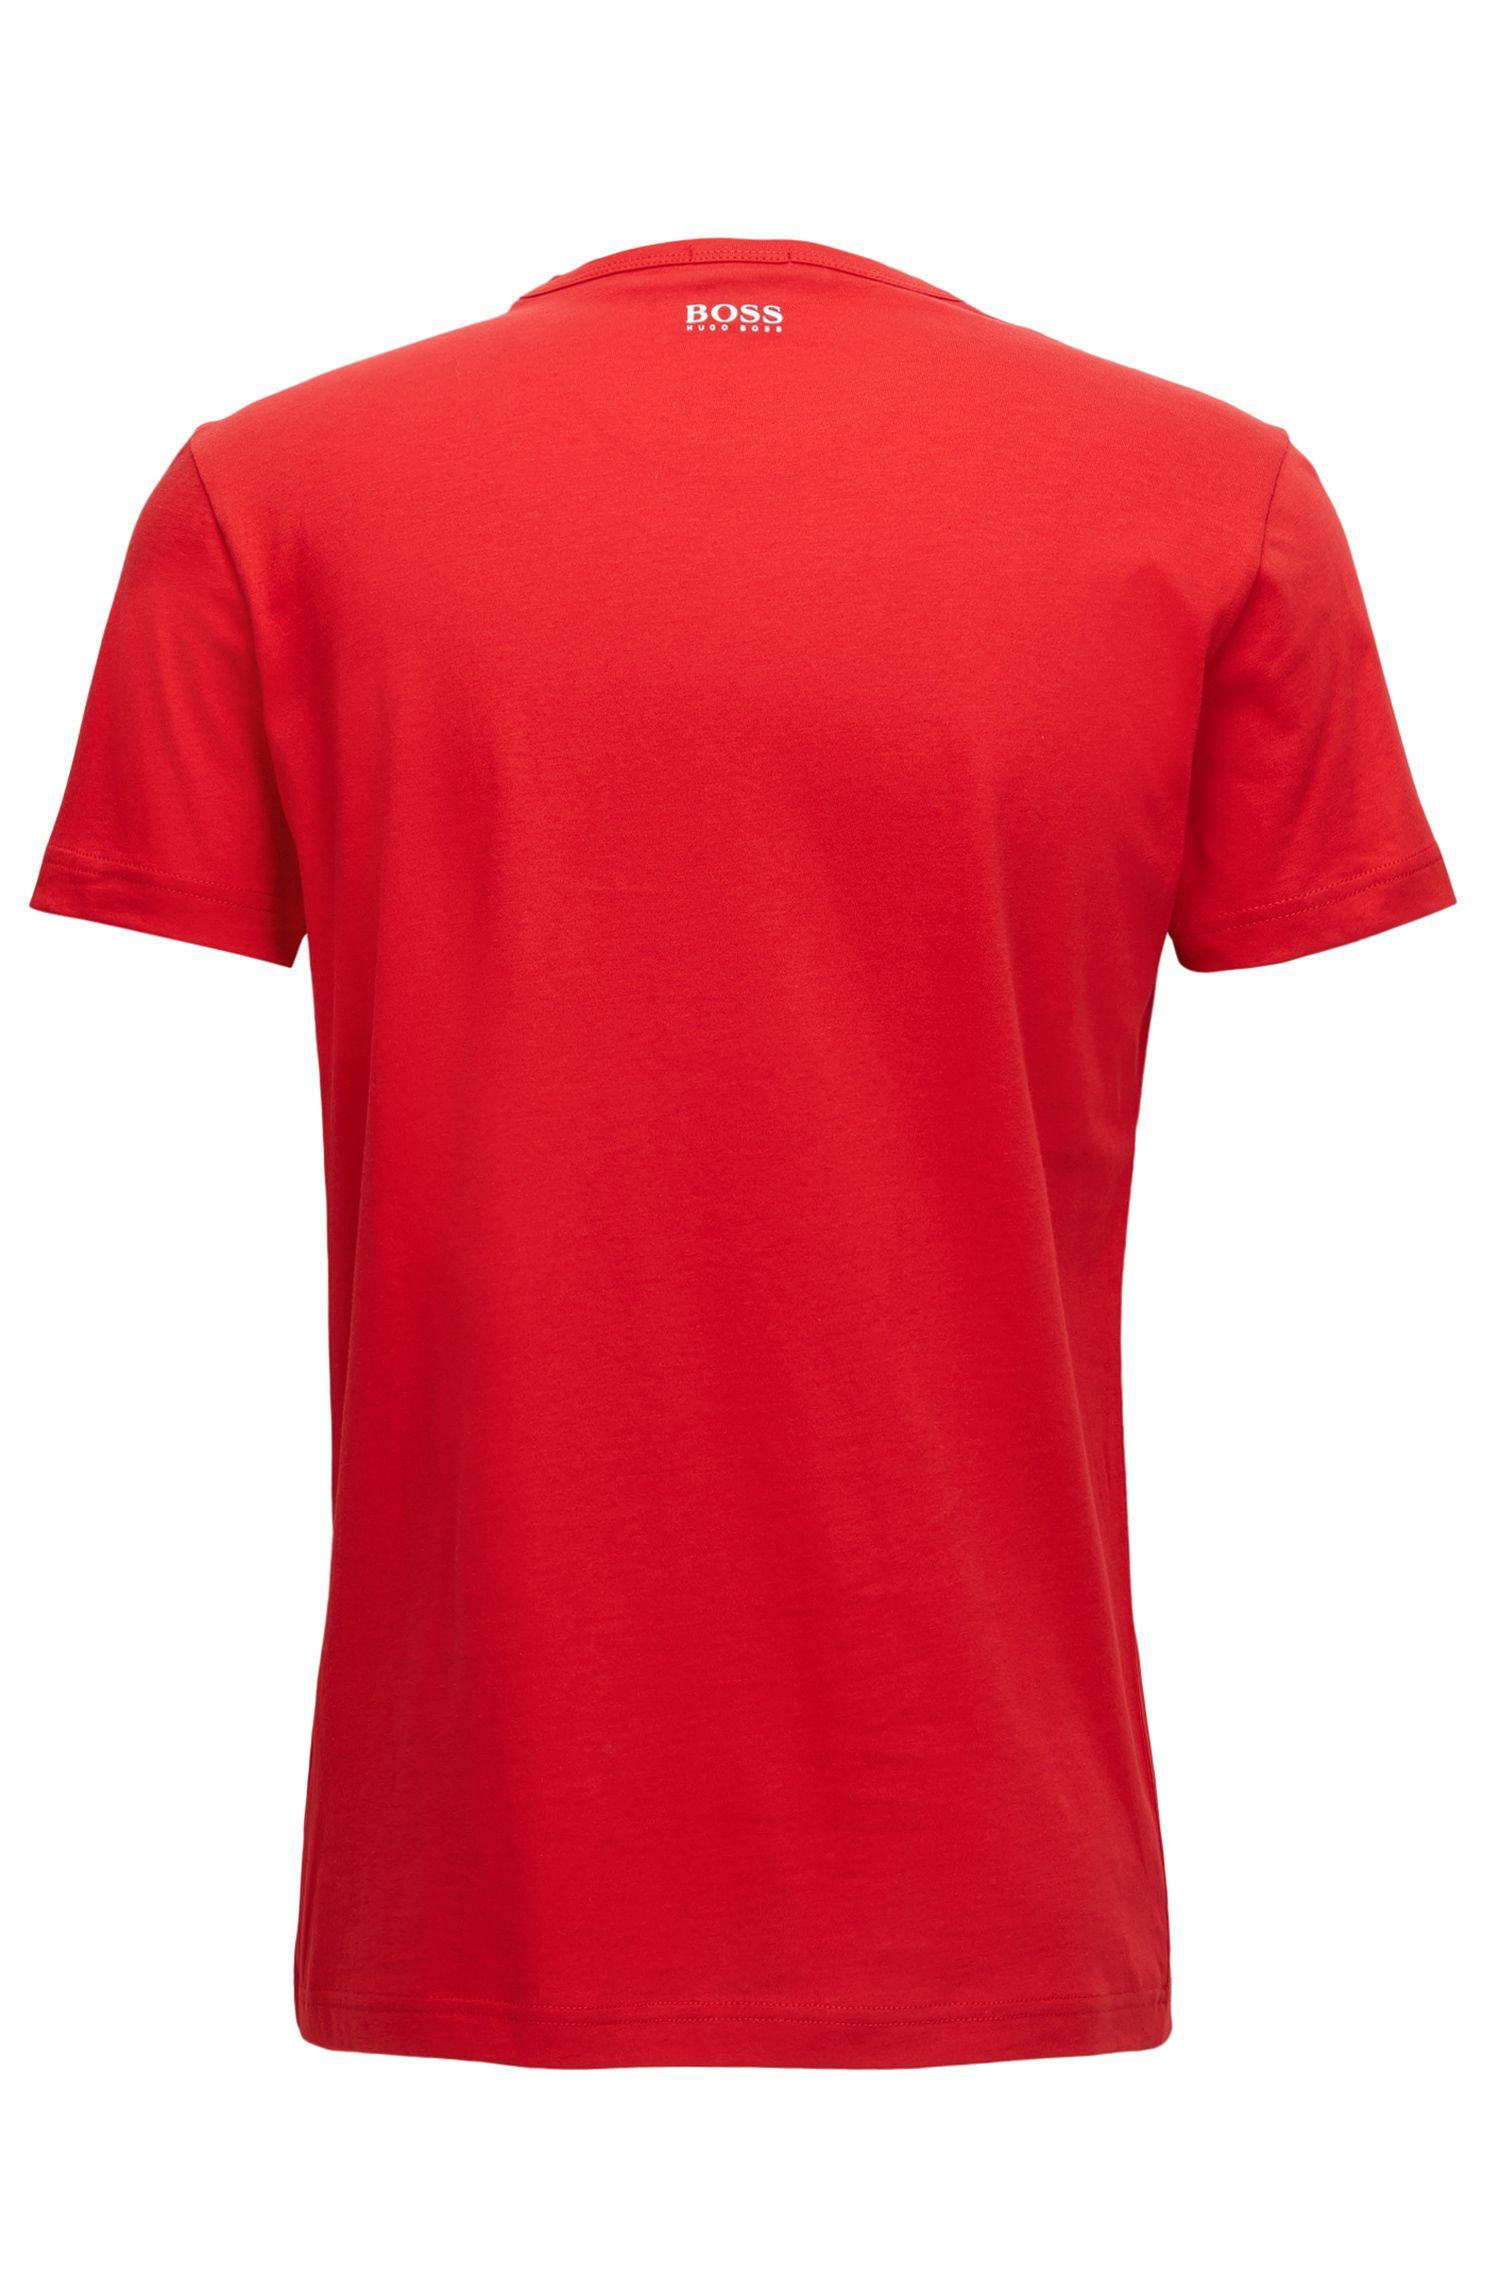 Logo-Print Graphic T-Shirt   Tee